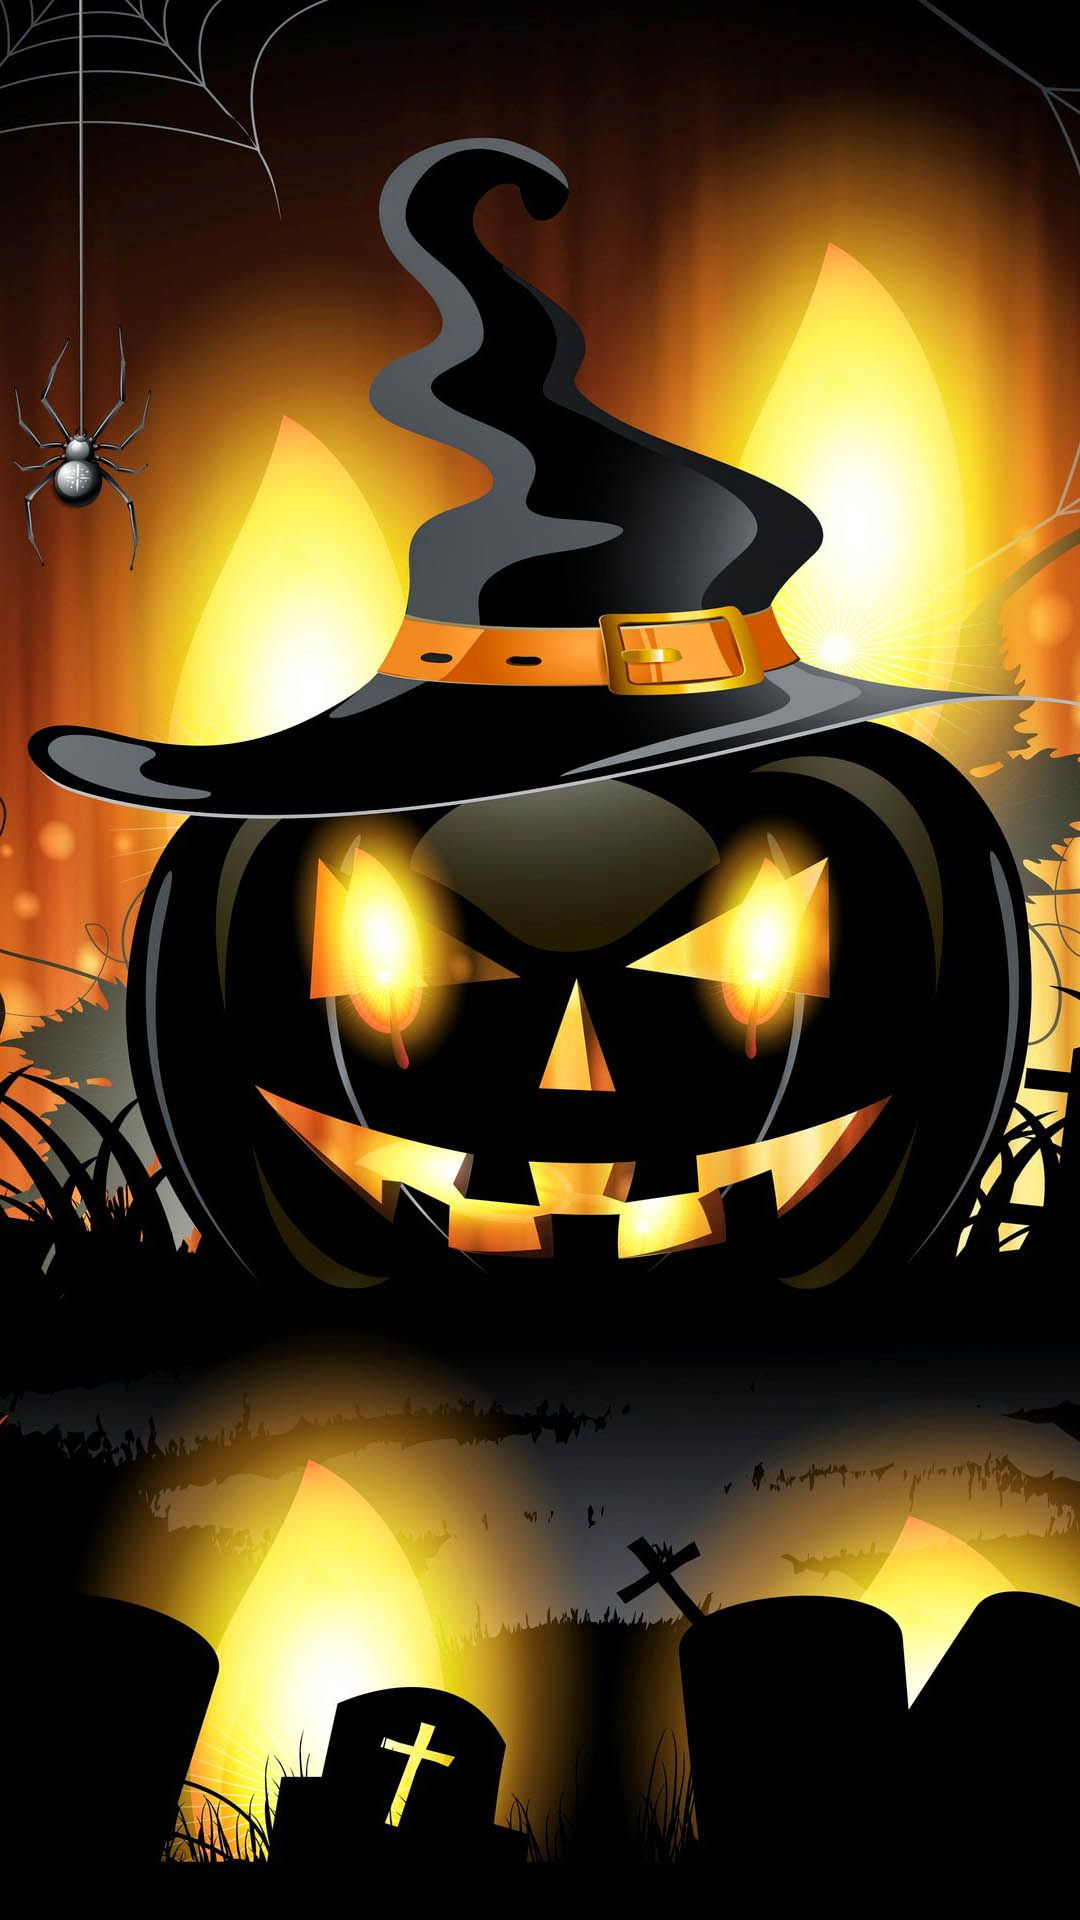 HD Wallpaper 29 Halloween backgrounds, Scary halloween